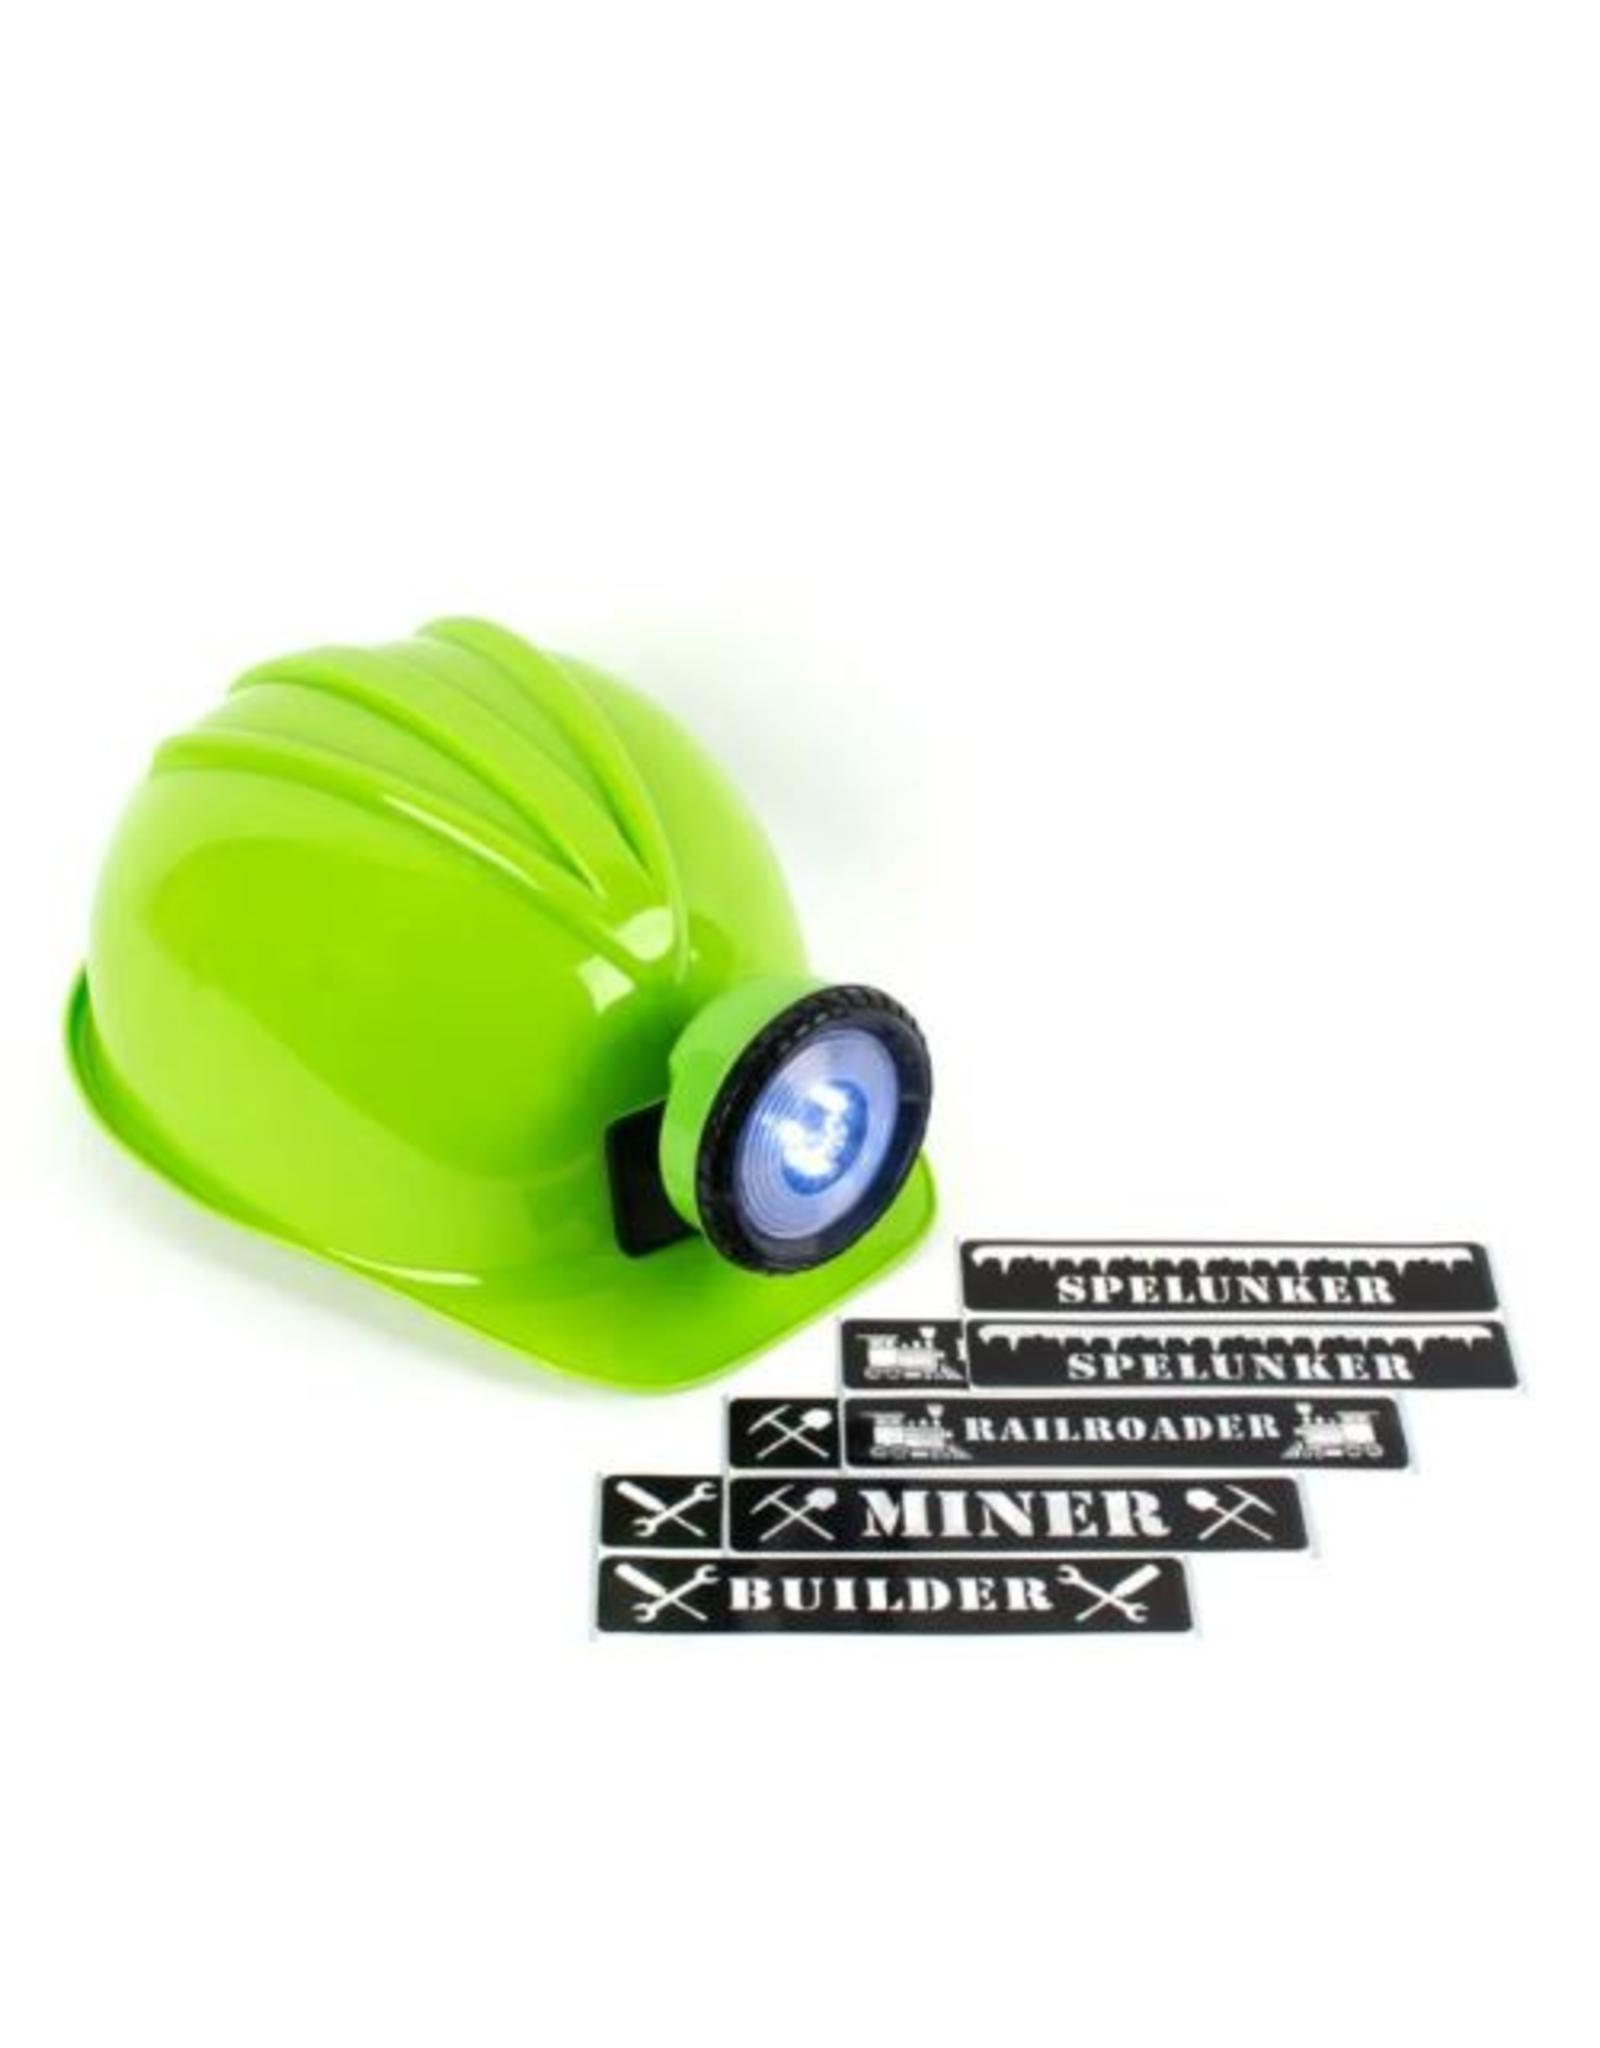 Squire Boone Miner Helmet